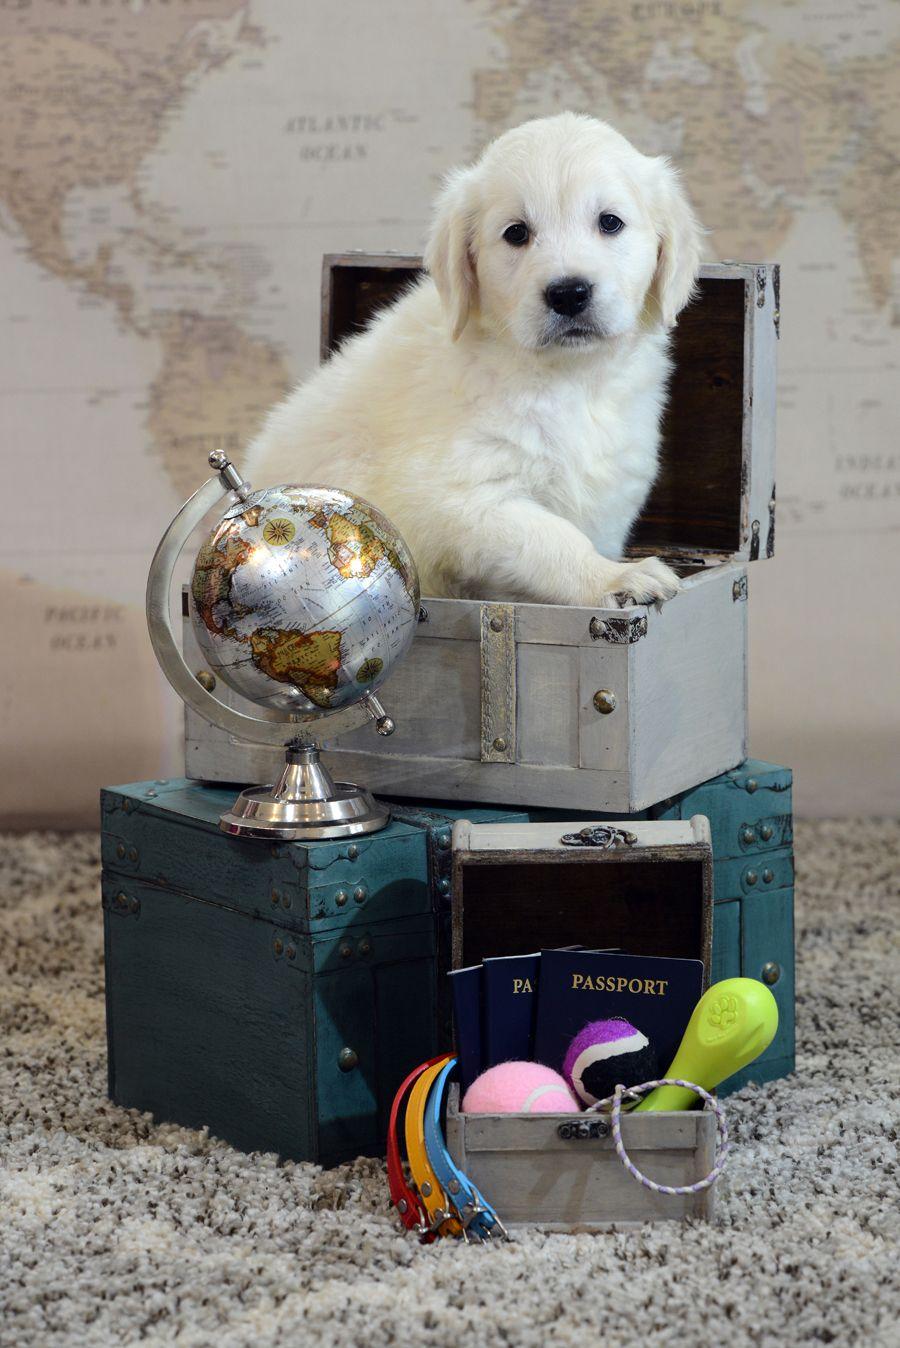 Golden Retriever Puppies Just Born Puppies English Golden